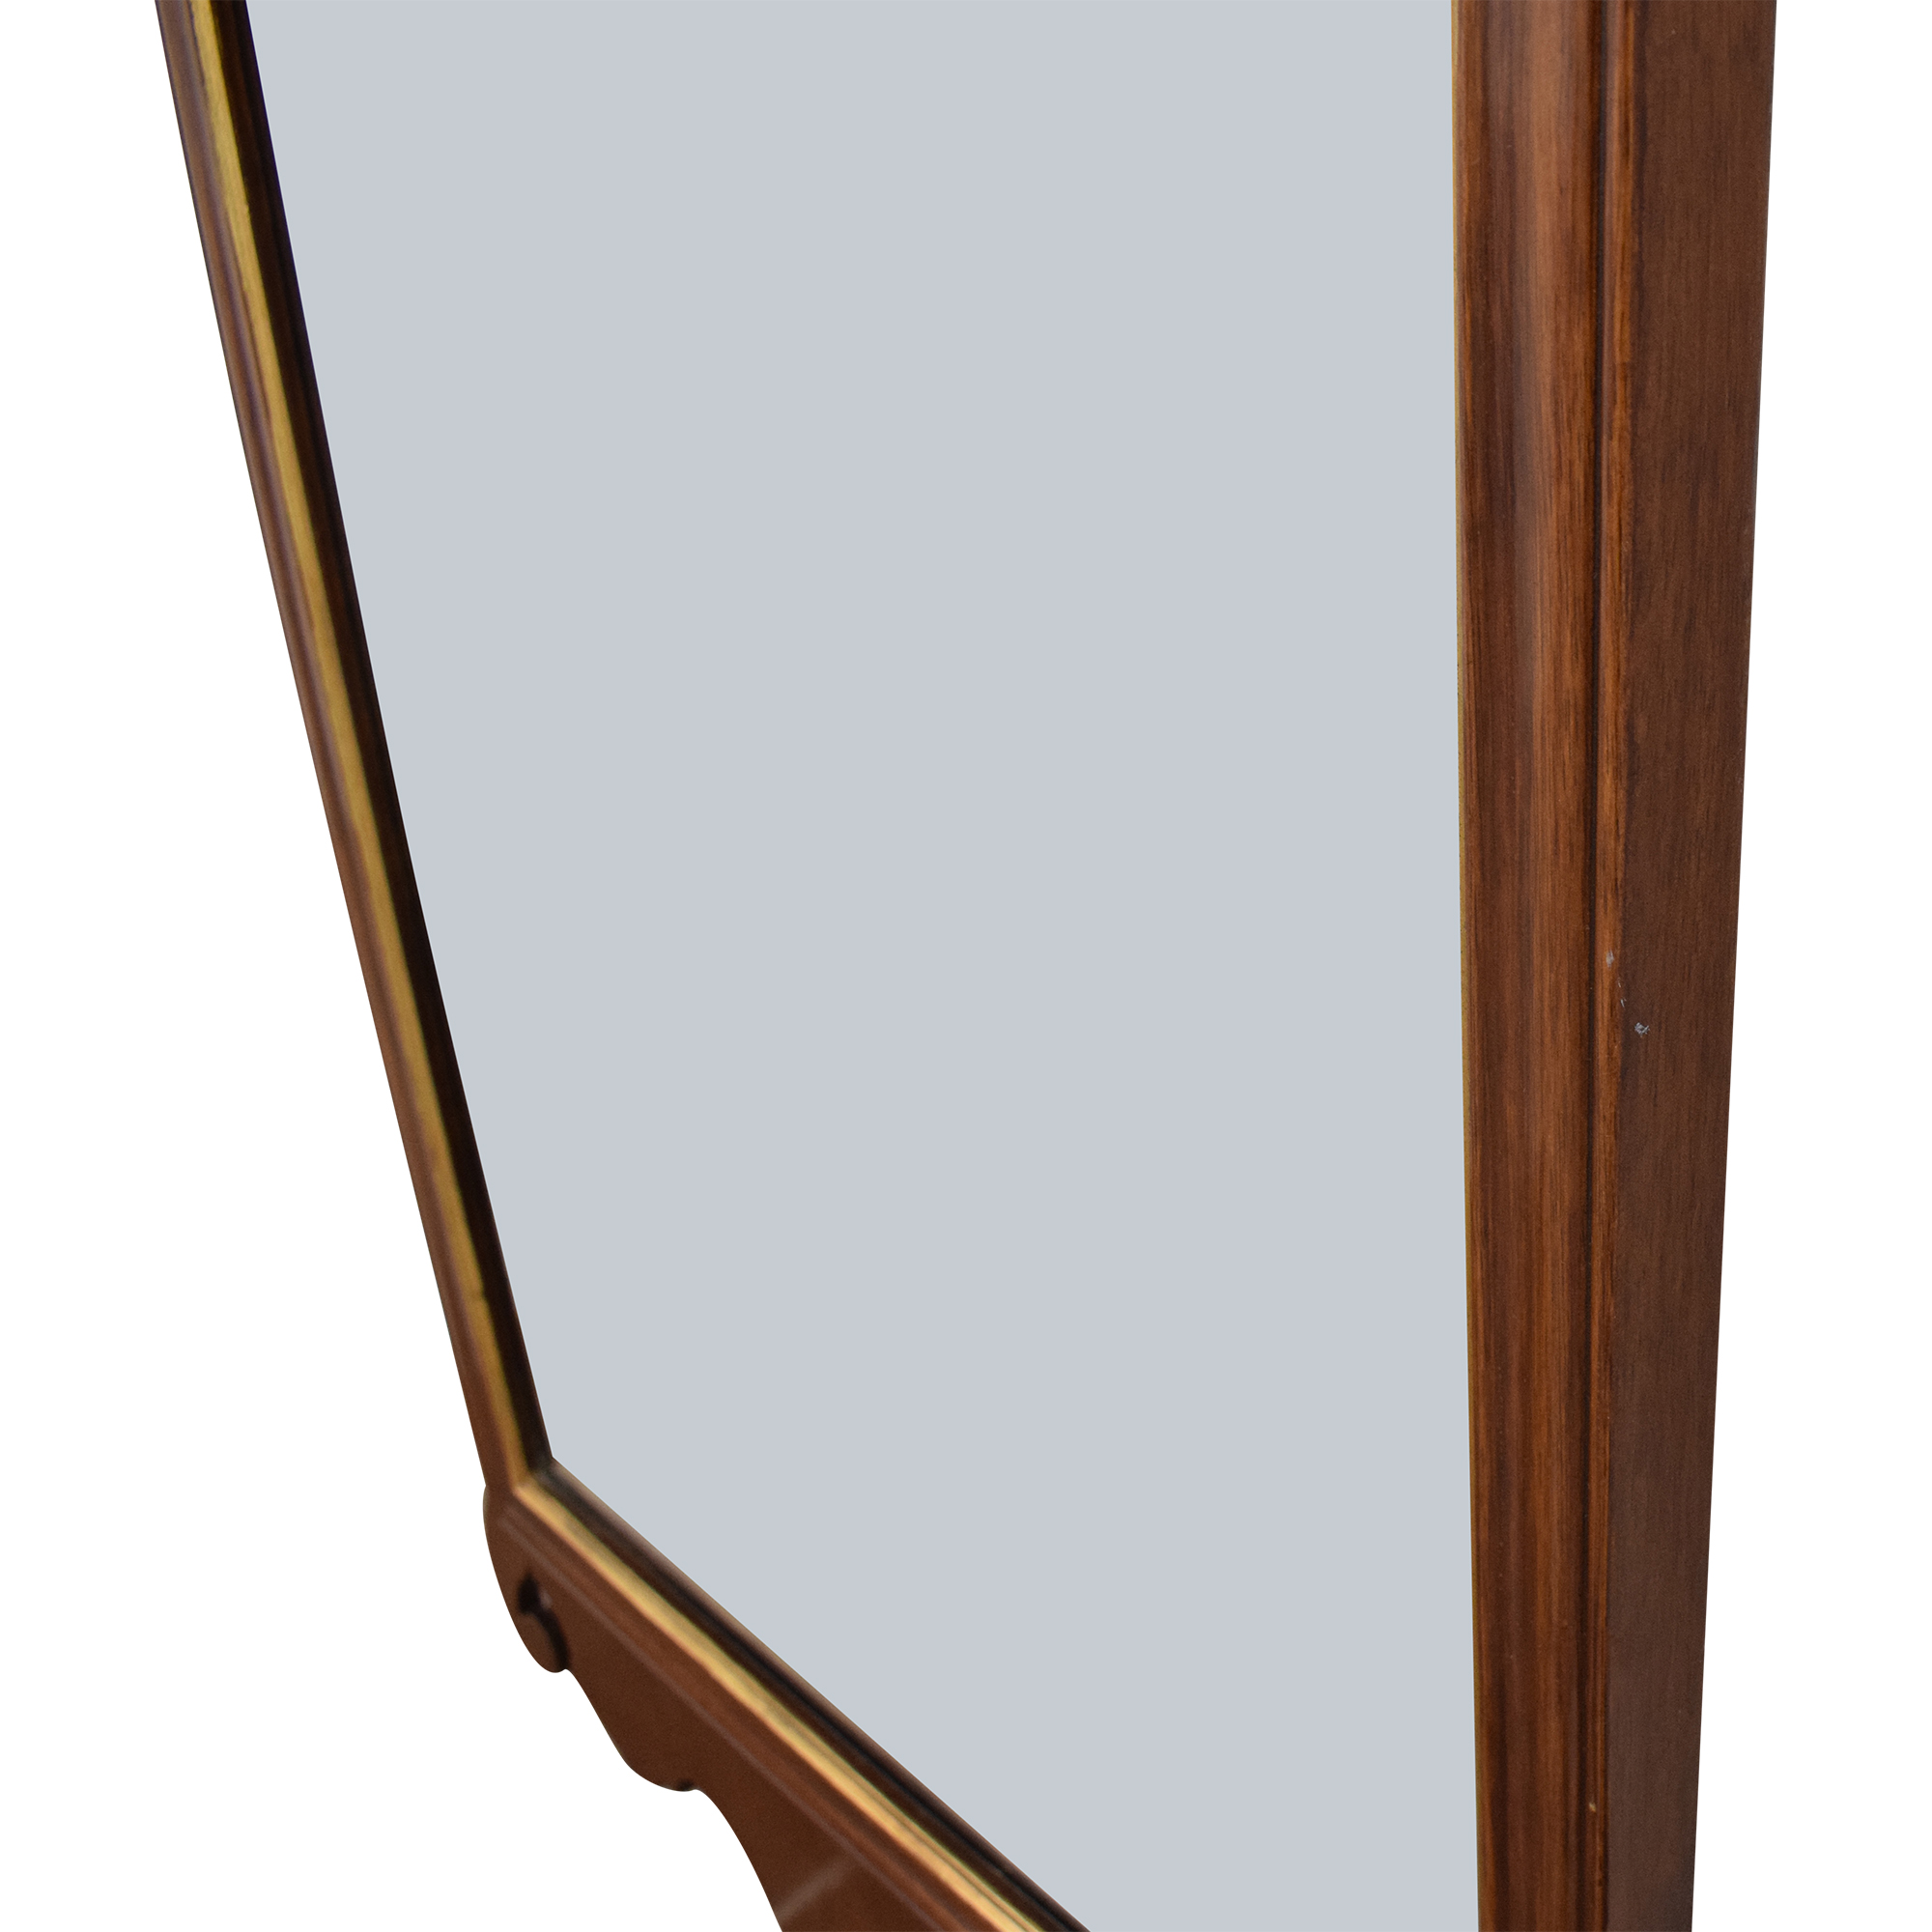 Friedman Brothers Friedman Brothers Williamsburg Chippendale Wall Mirror Decor